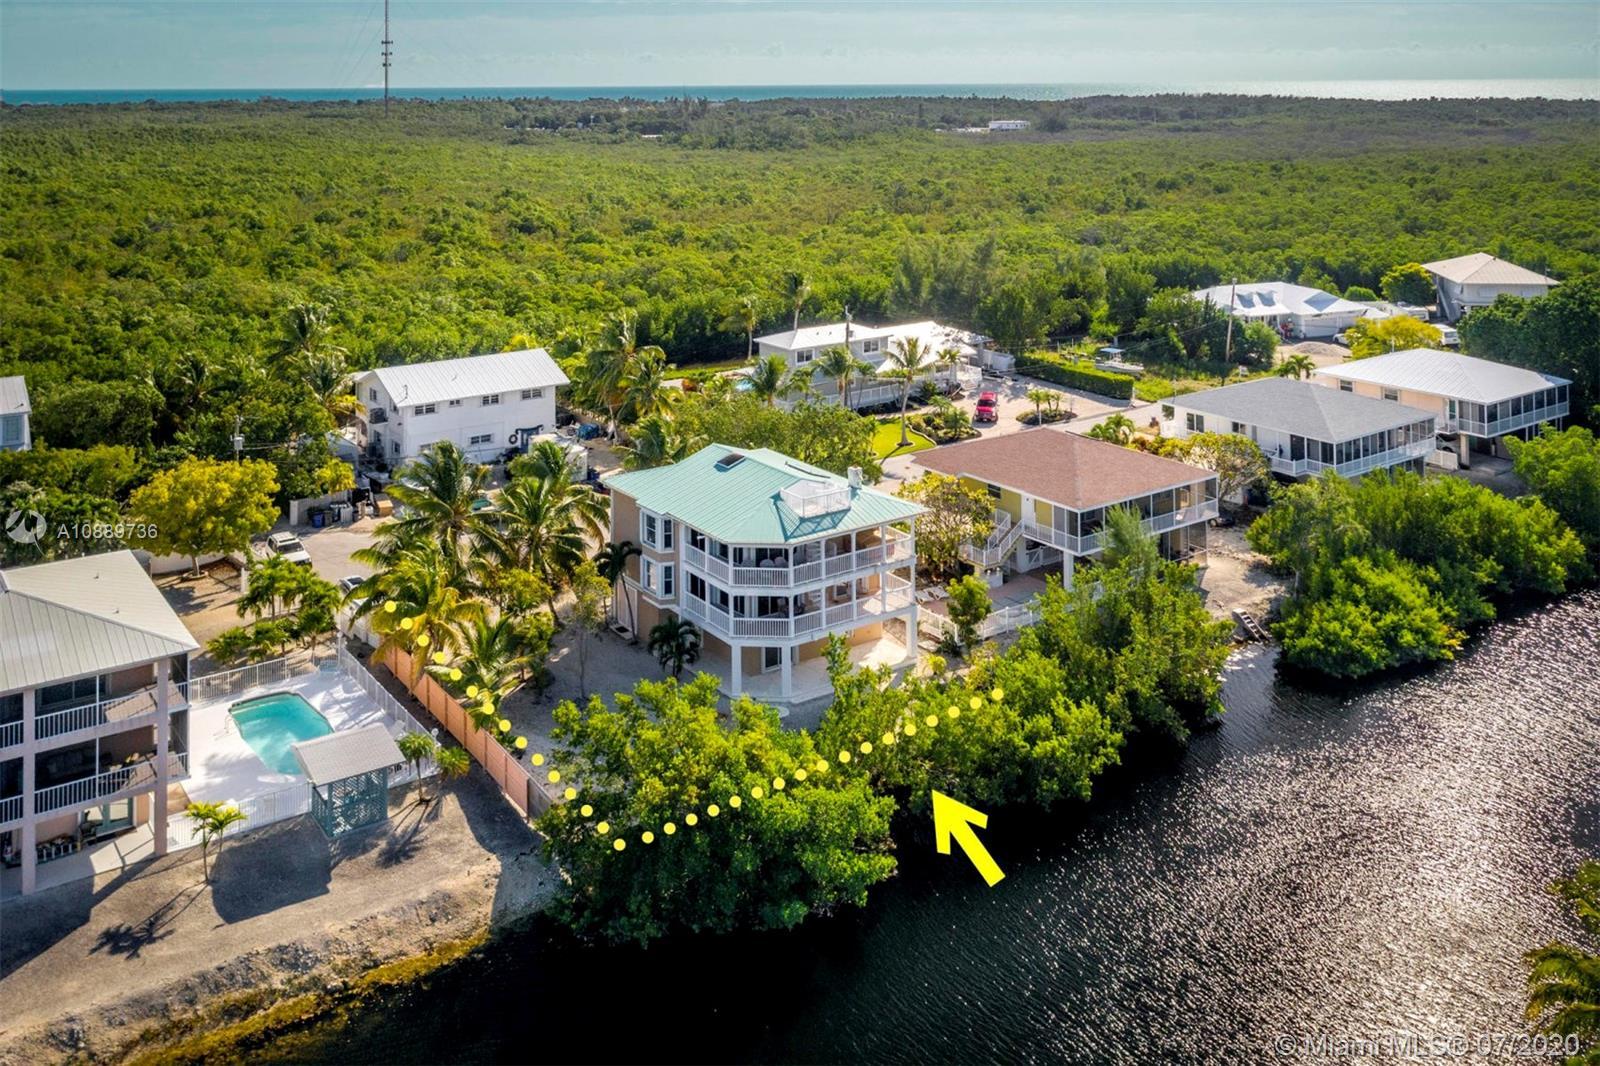 186 Venetian Way Property Photo - Islamorada, FL real estate listing